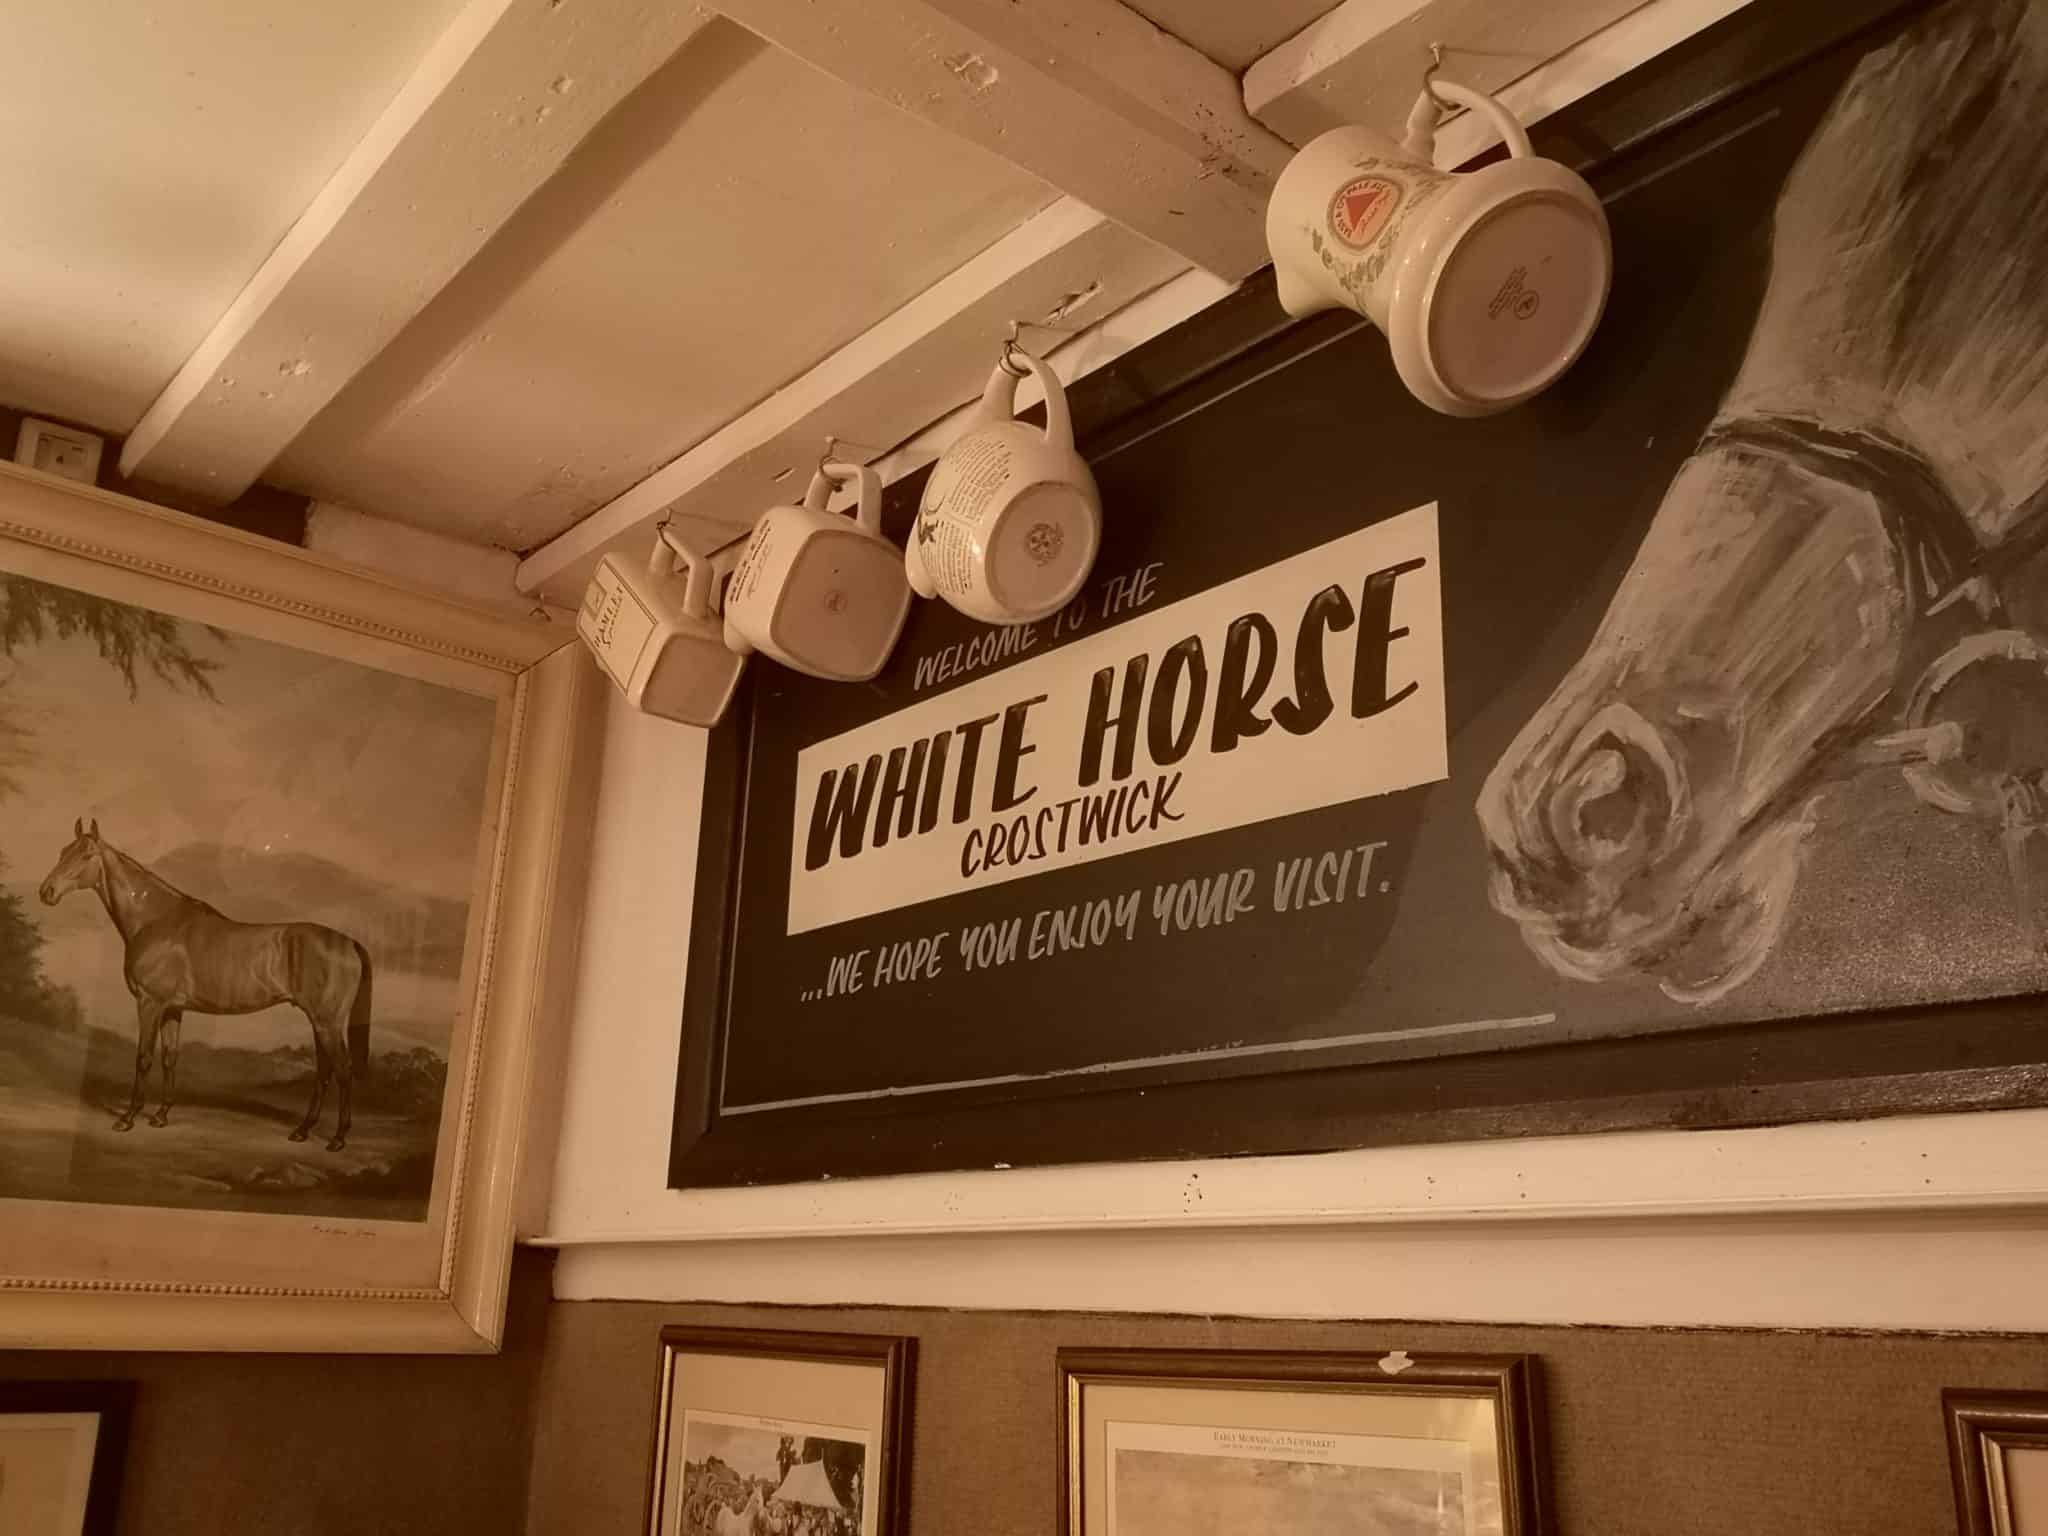 The White Horse, Crostwick